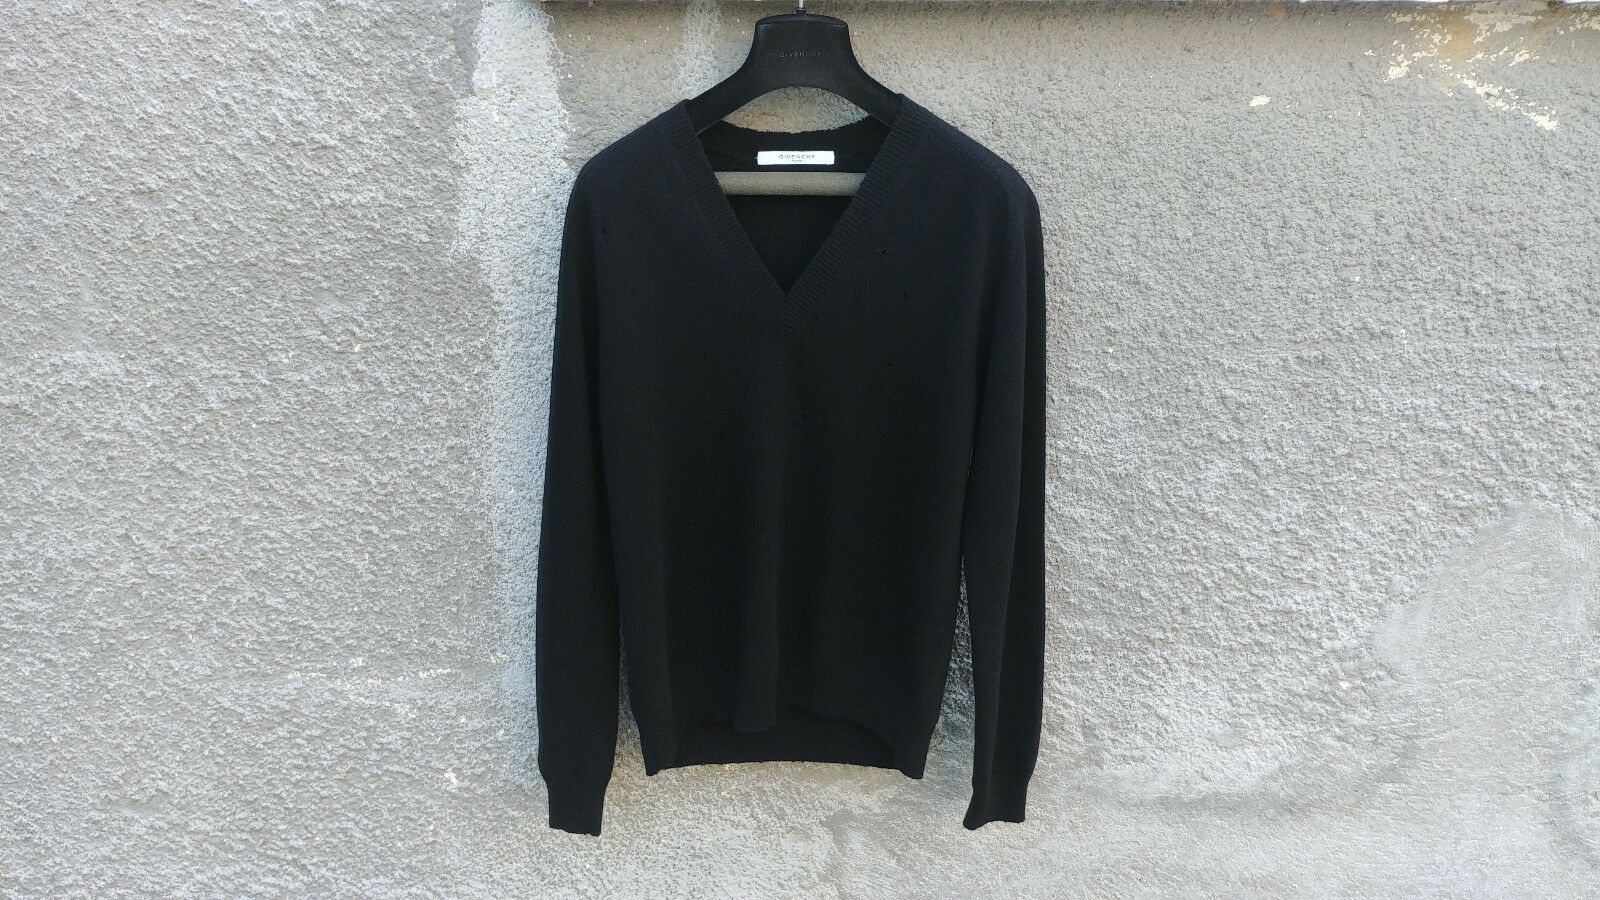 Givenchy Destroyed Distressed Wool Slim Fit Rottweiler Knit Sweater Größe L (M)